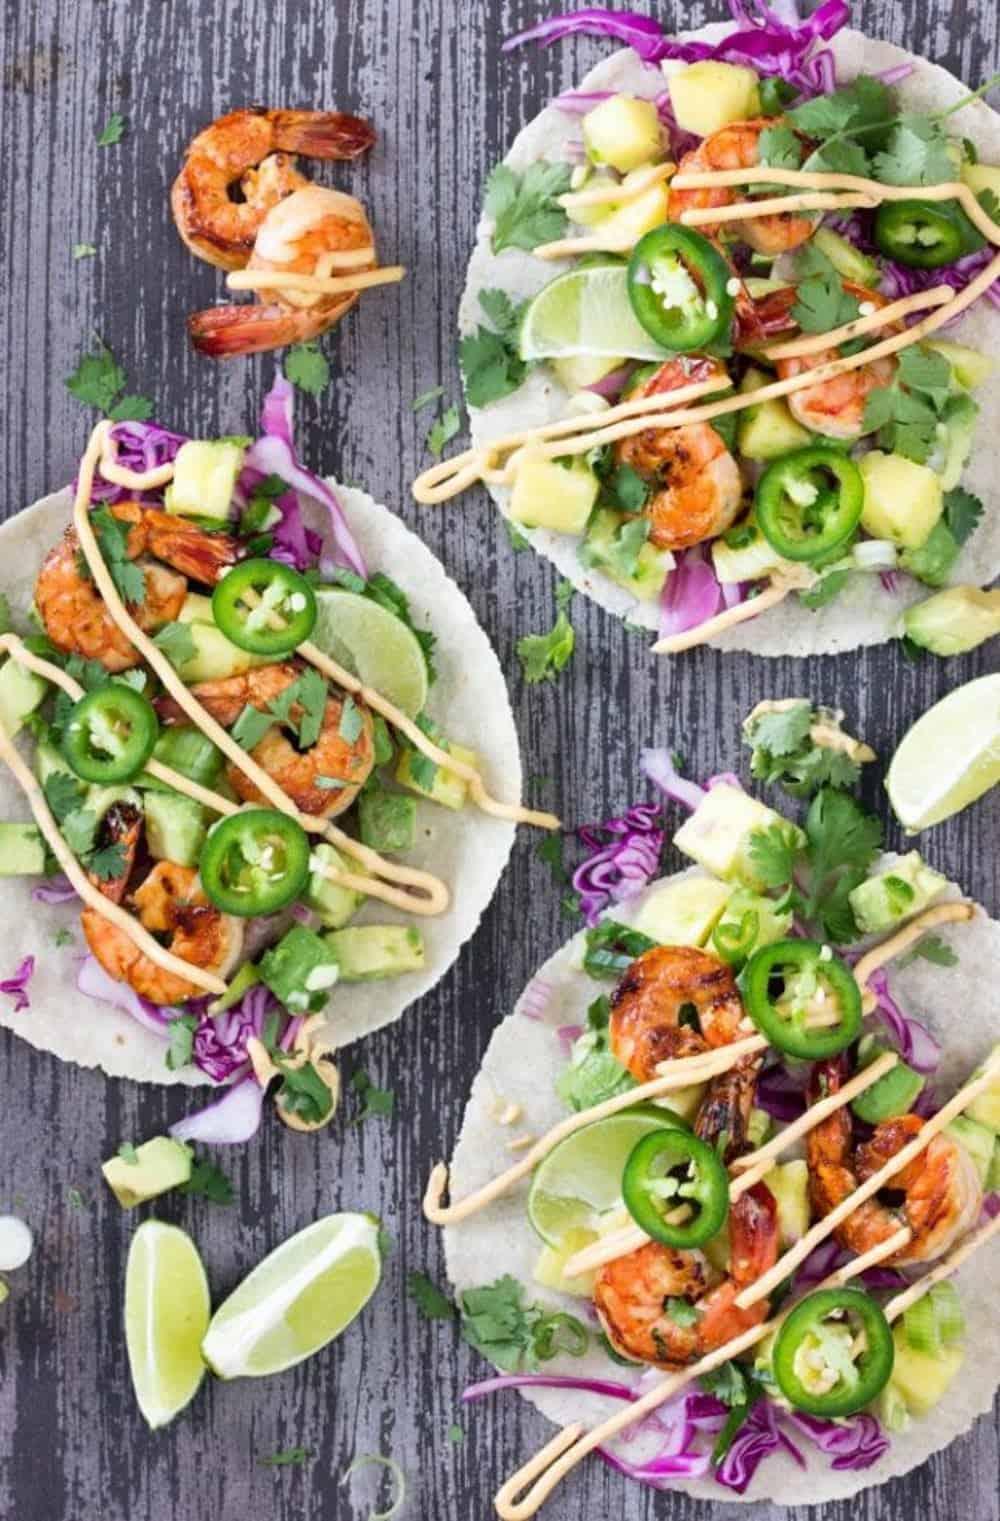 Shrimp tacos with pineapple salsa